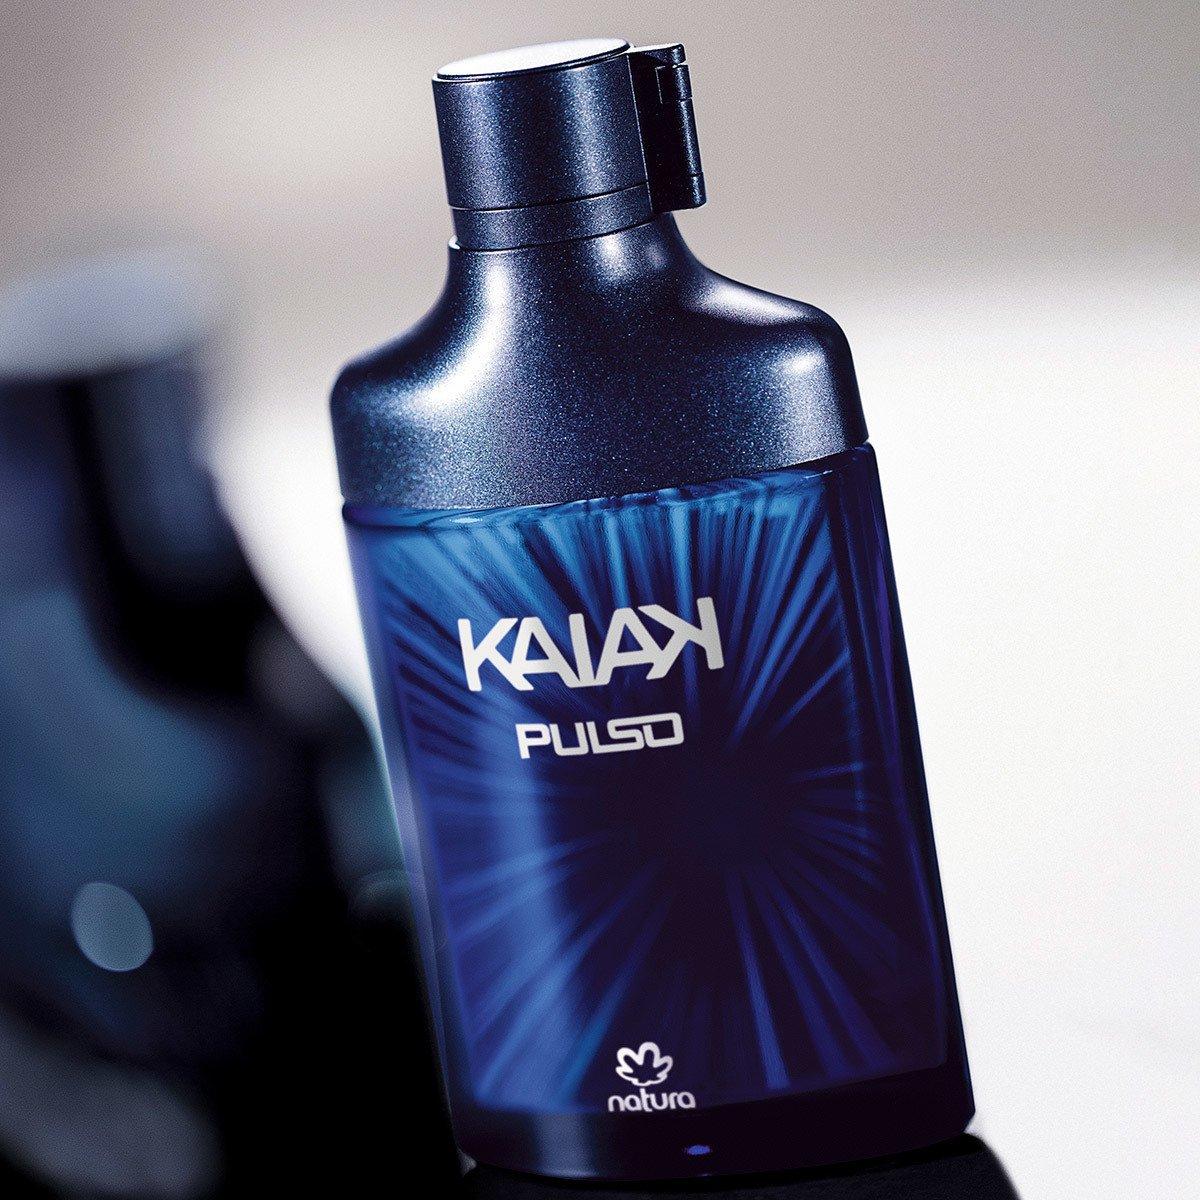 Desodorante Colônia Kaiak Pulso Masculino!  #natura #kaiakpulso #masculino #perfumaria #casadeperfumariadobrasil #estelaciervofranqueadanaturapic.twitter.com/Xx9ZCfdgZO